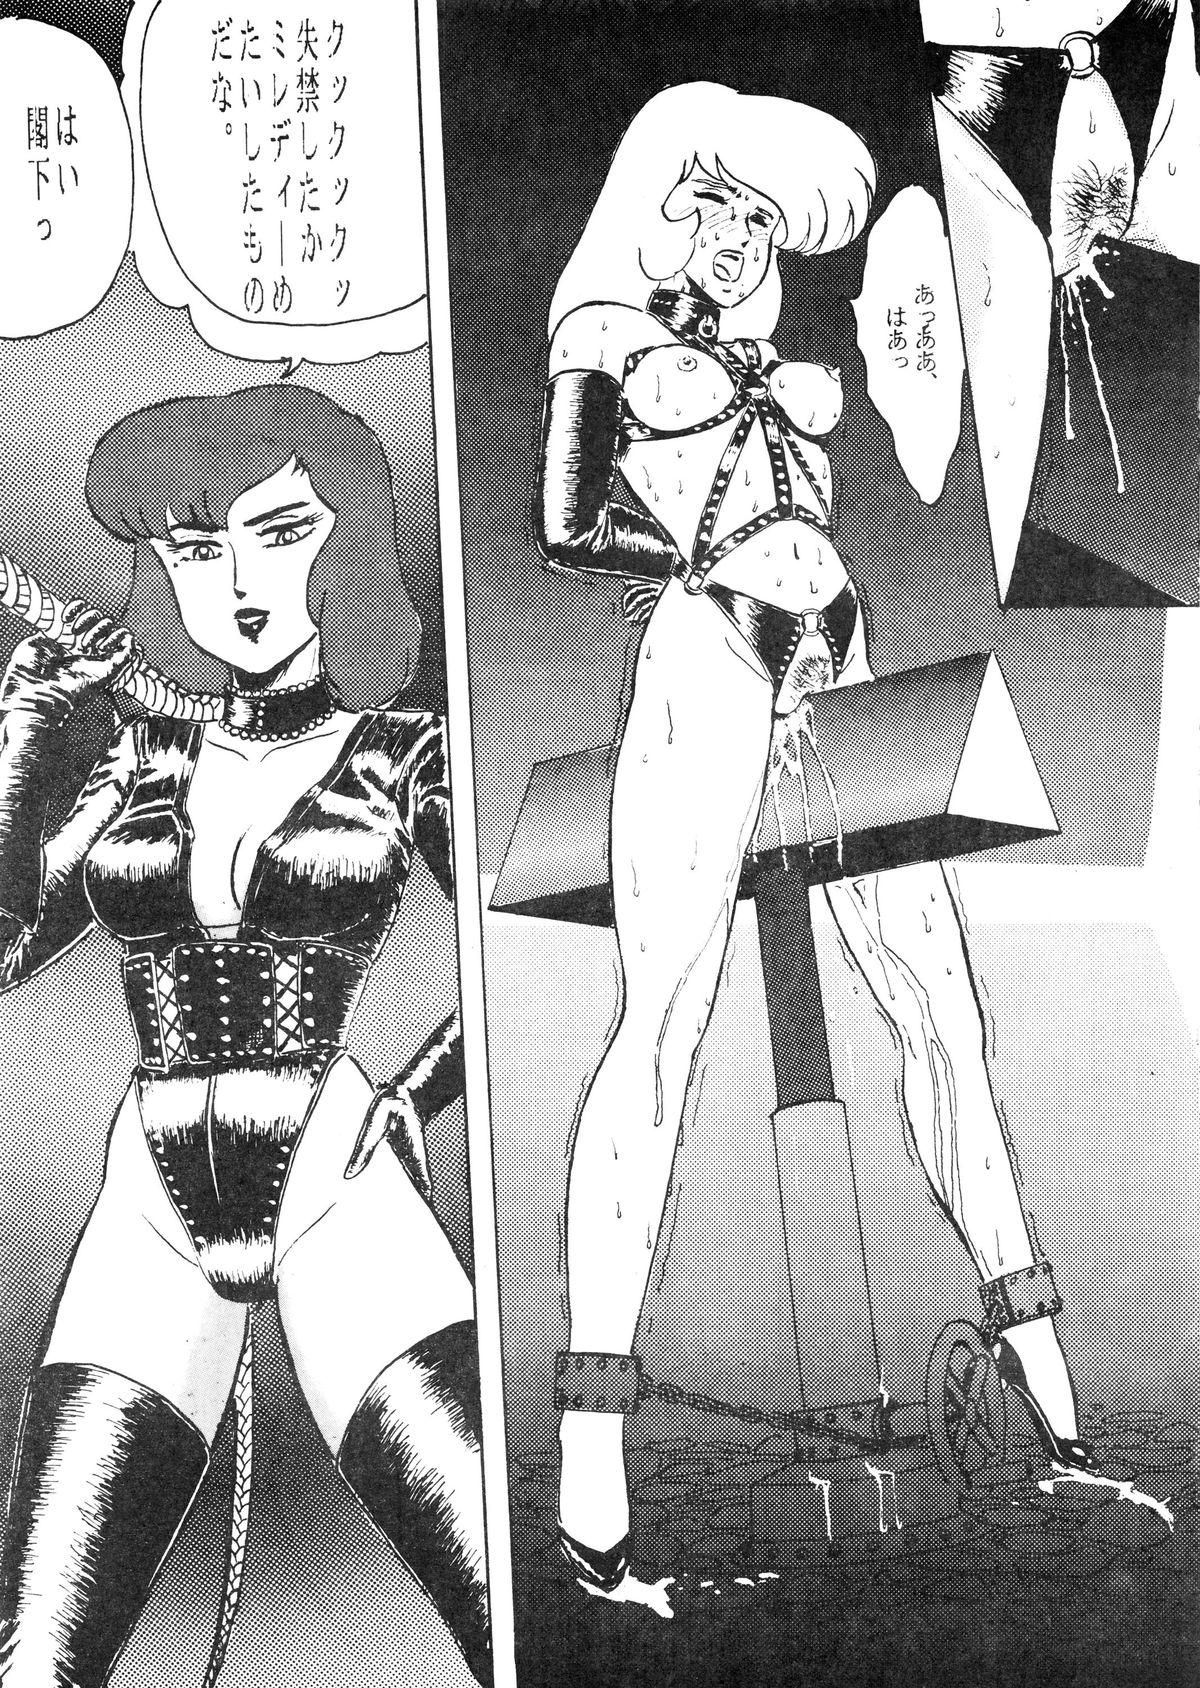 [Secret Society Chi (Iijima Mario)] Kai II - Iijima Mario Kojin-shi - (Various) 25